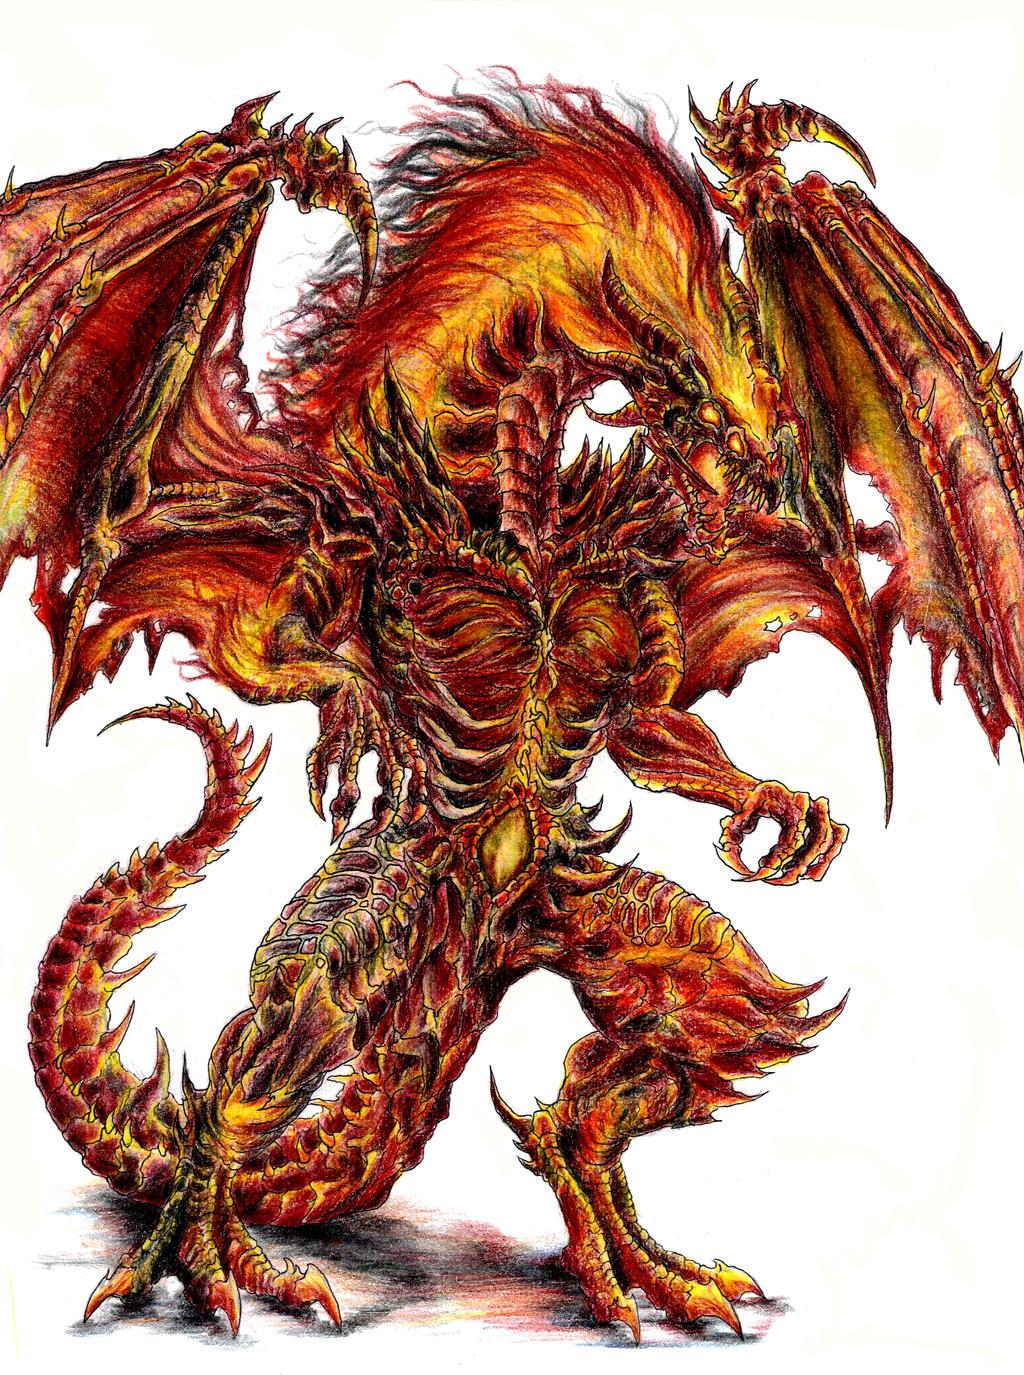 Fire Dragon Deathlord By Wretchedspawn2012 On Deviantart